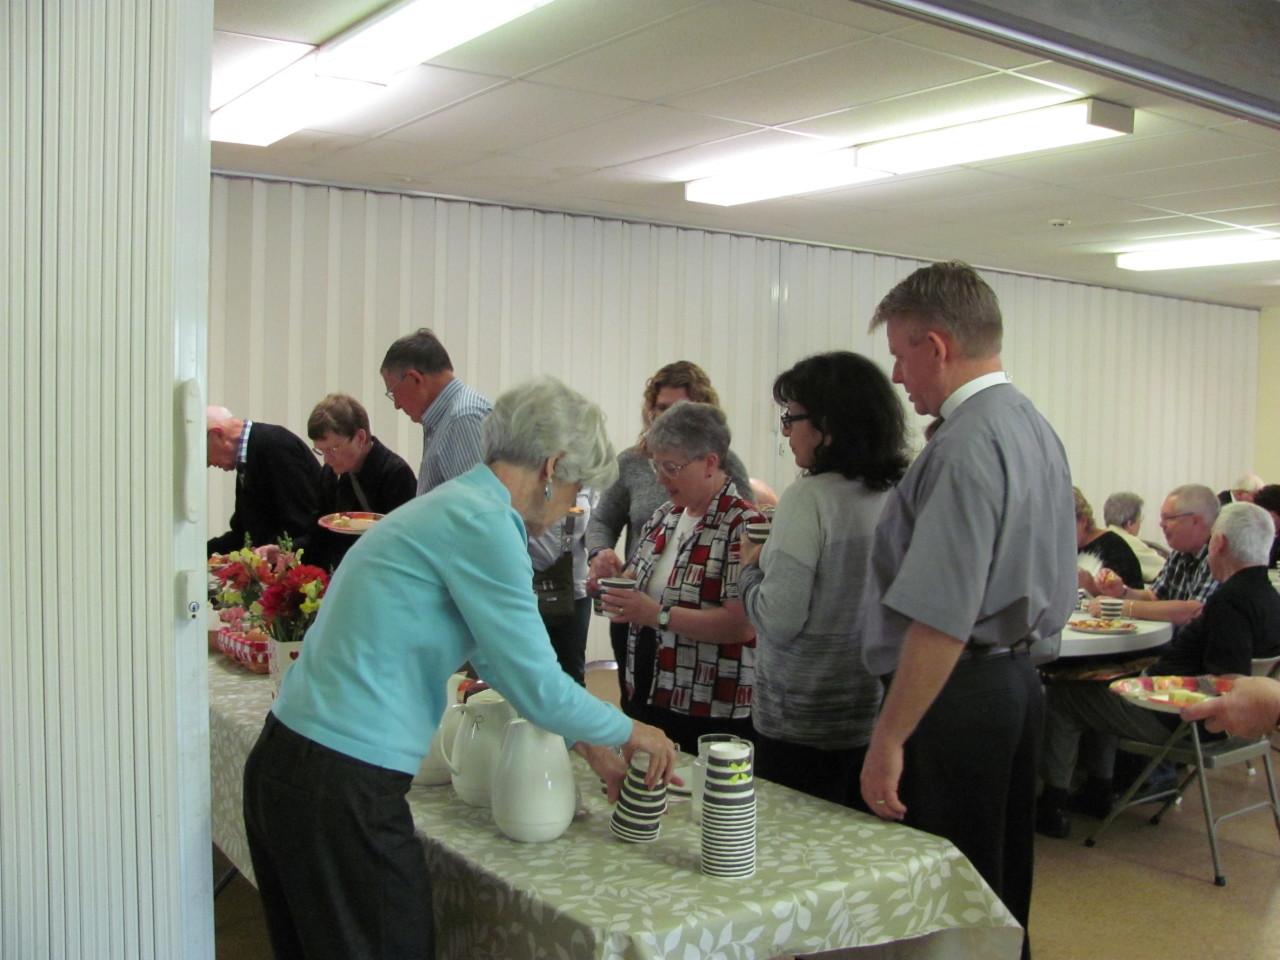 Potluck Brunch at Reunion Sunday